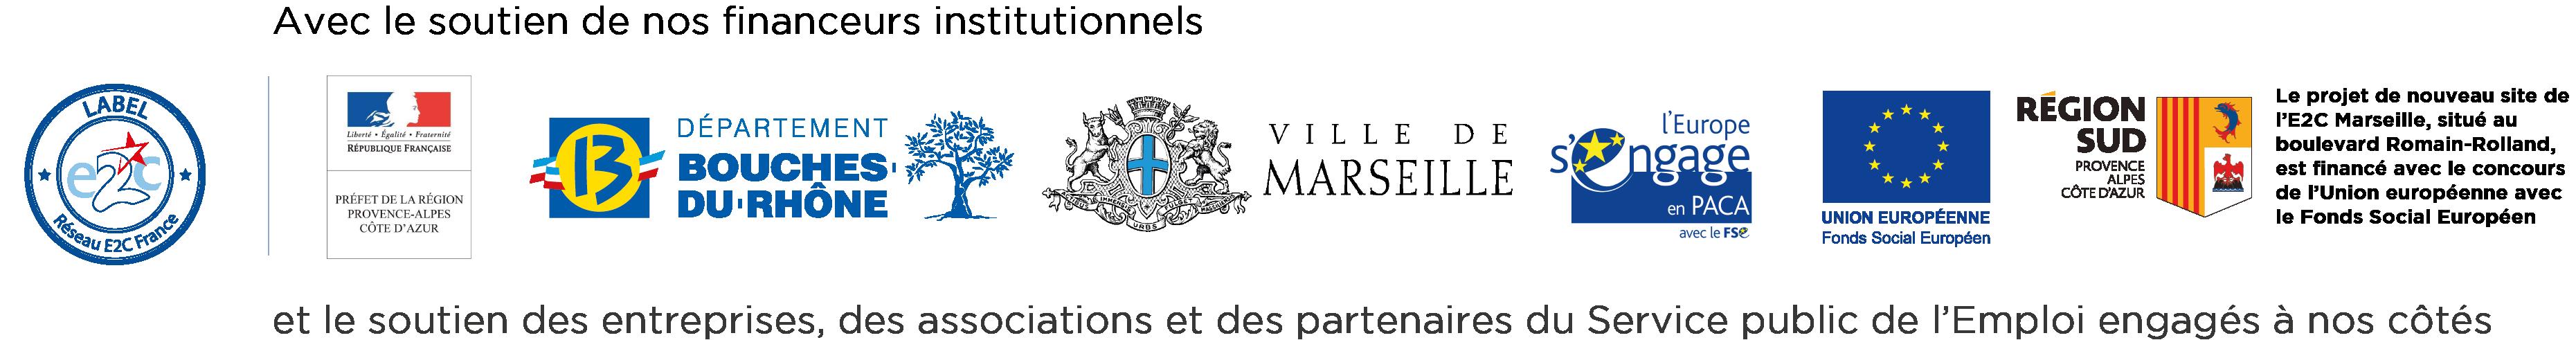 financeurs-E2C-Marseille